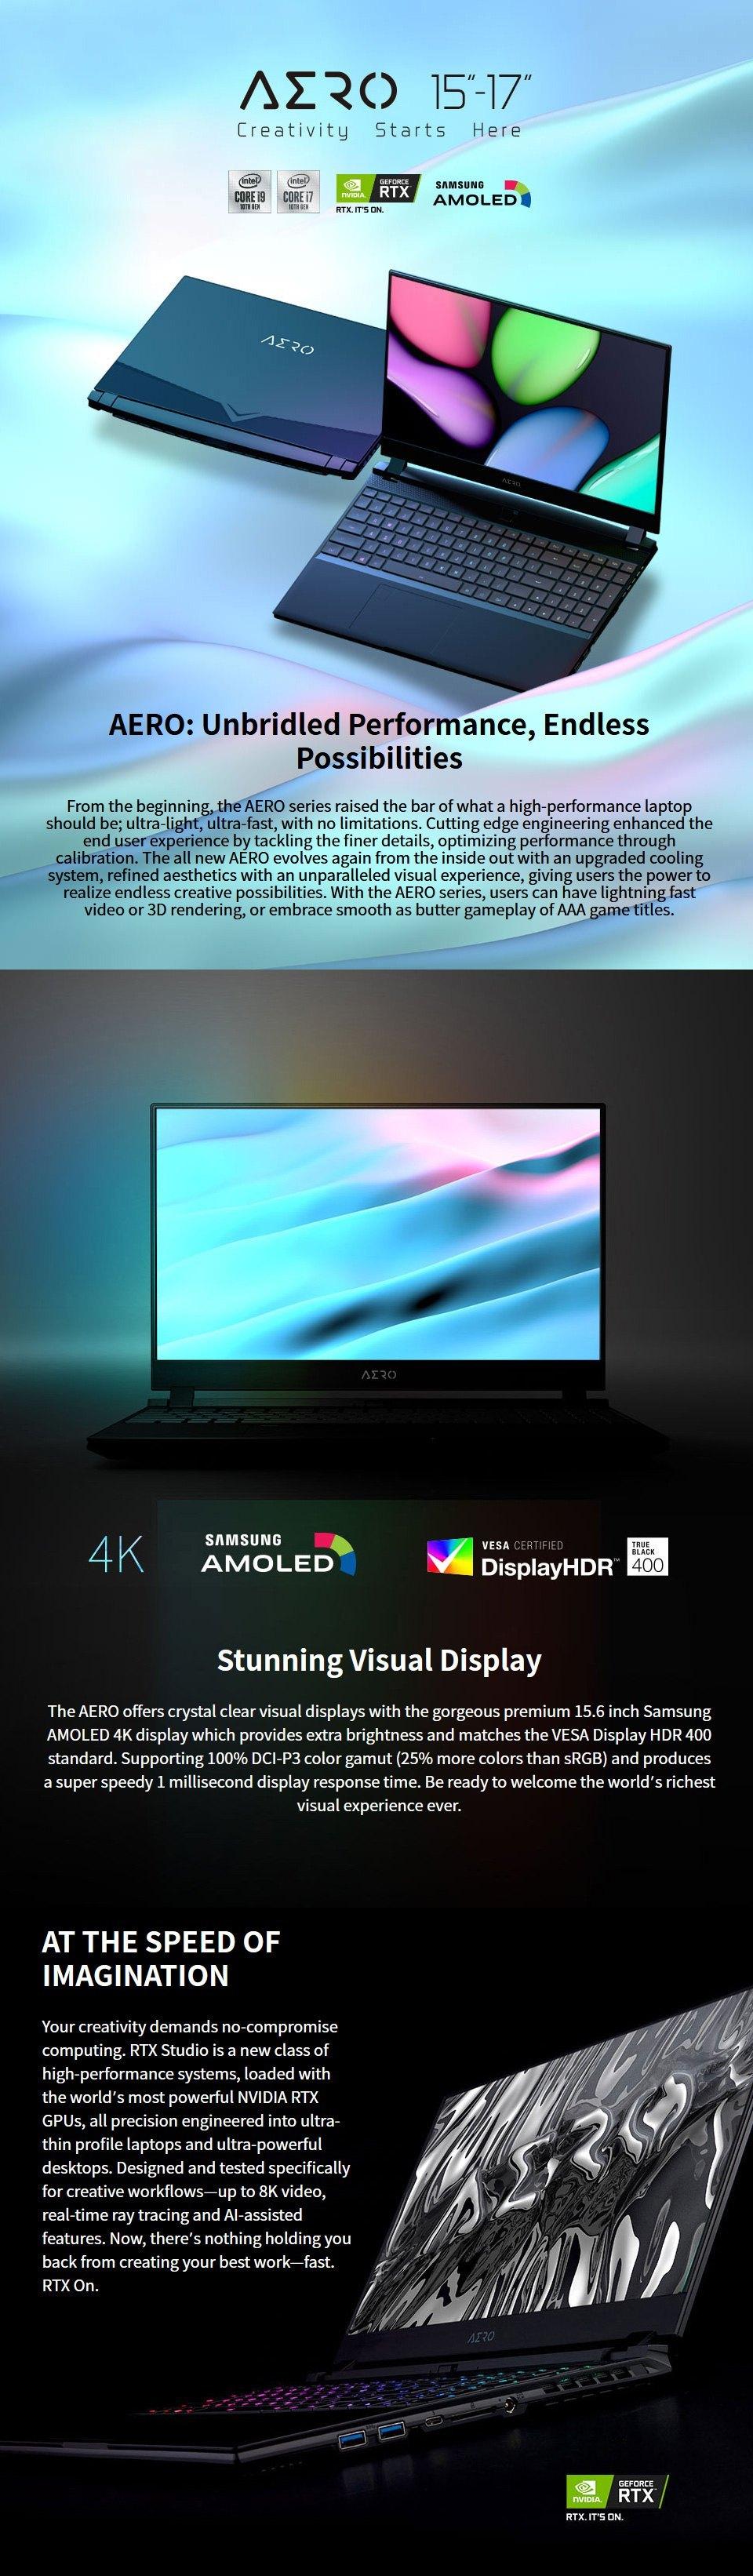 Gigabyte AERO 15 Core I7 RTX 2070 Super 15.6in OLED UHD Laptop features